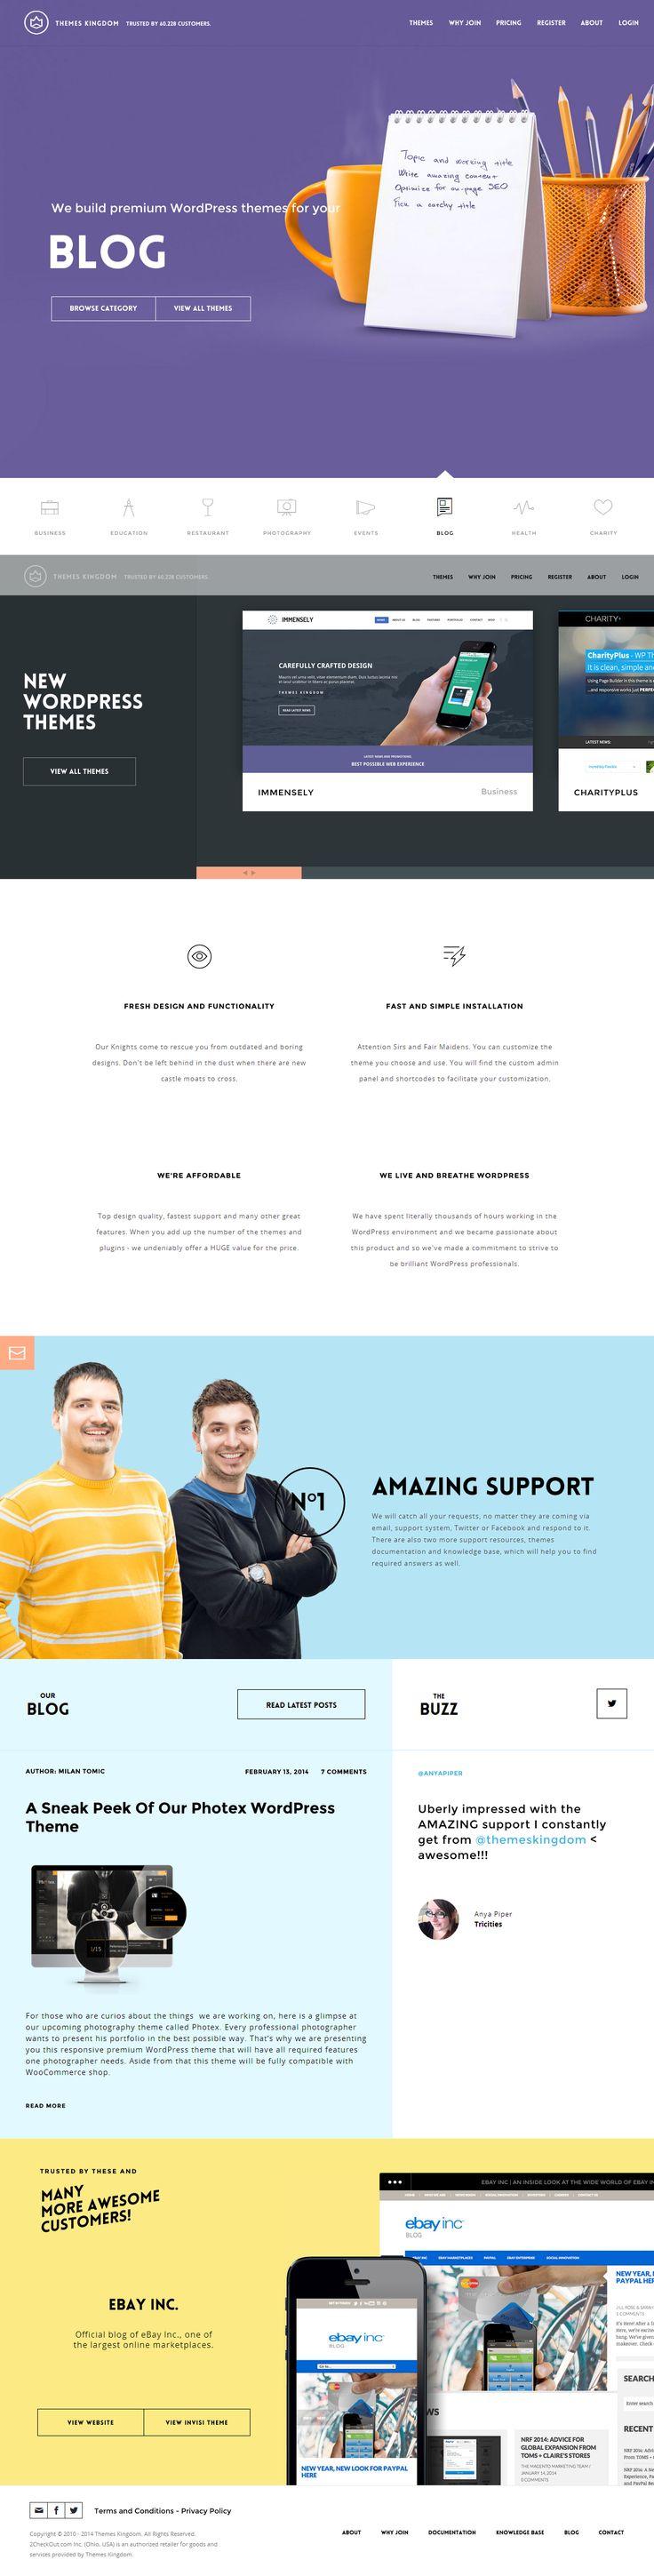 Themes Kingdom - Premium WordPress Themes, 25 January 2014. http://www.awwwards.com/web-design-awards/themes-kingdom-premium-wordpress-themes #Scroll #OnePage #Colorful #HTML5 #UI #Inspiration